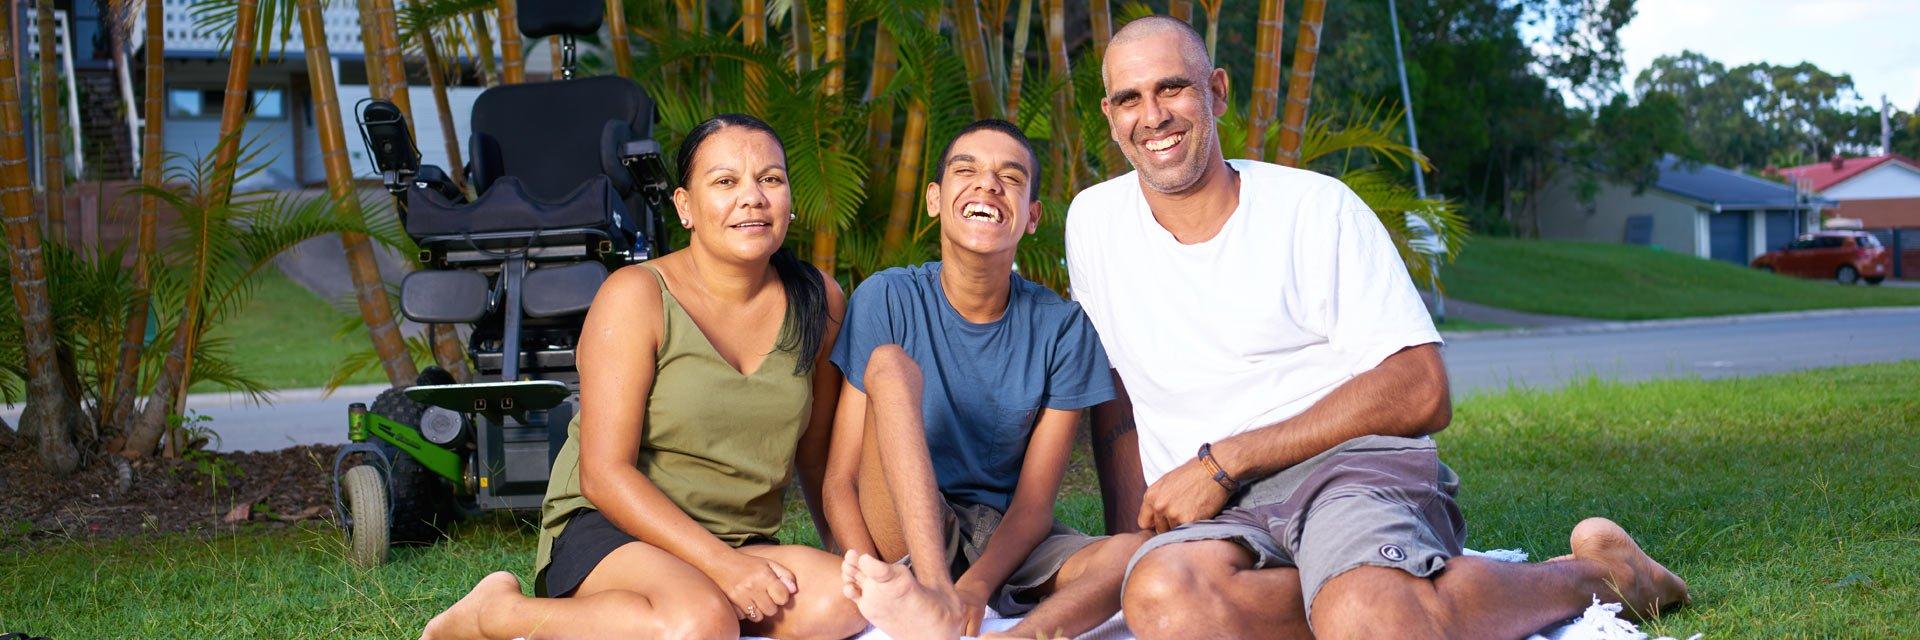 Aruma customer, Kobi and his family sitting outside on a picnic rug